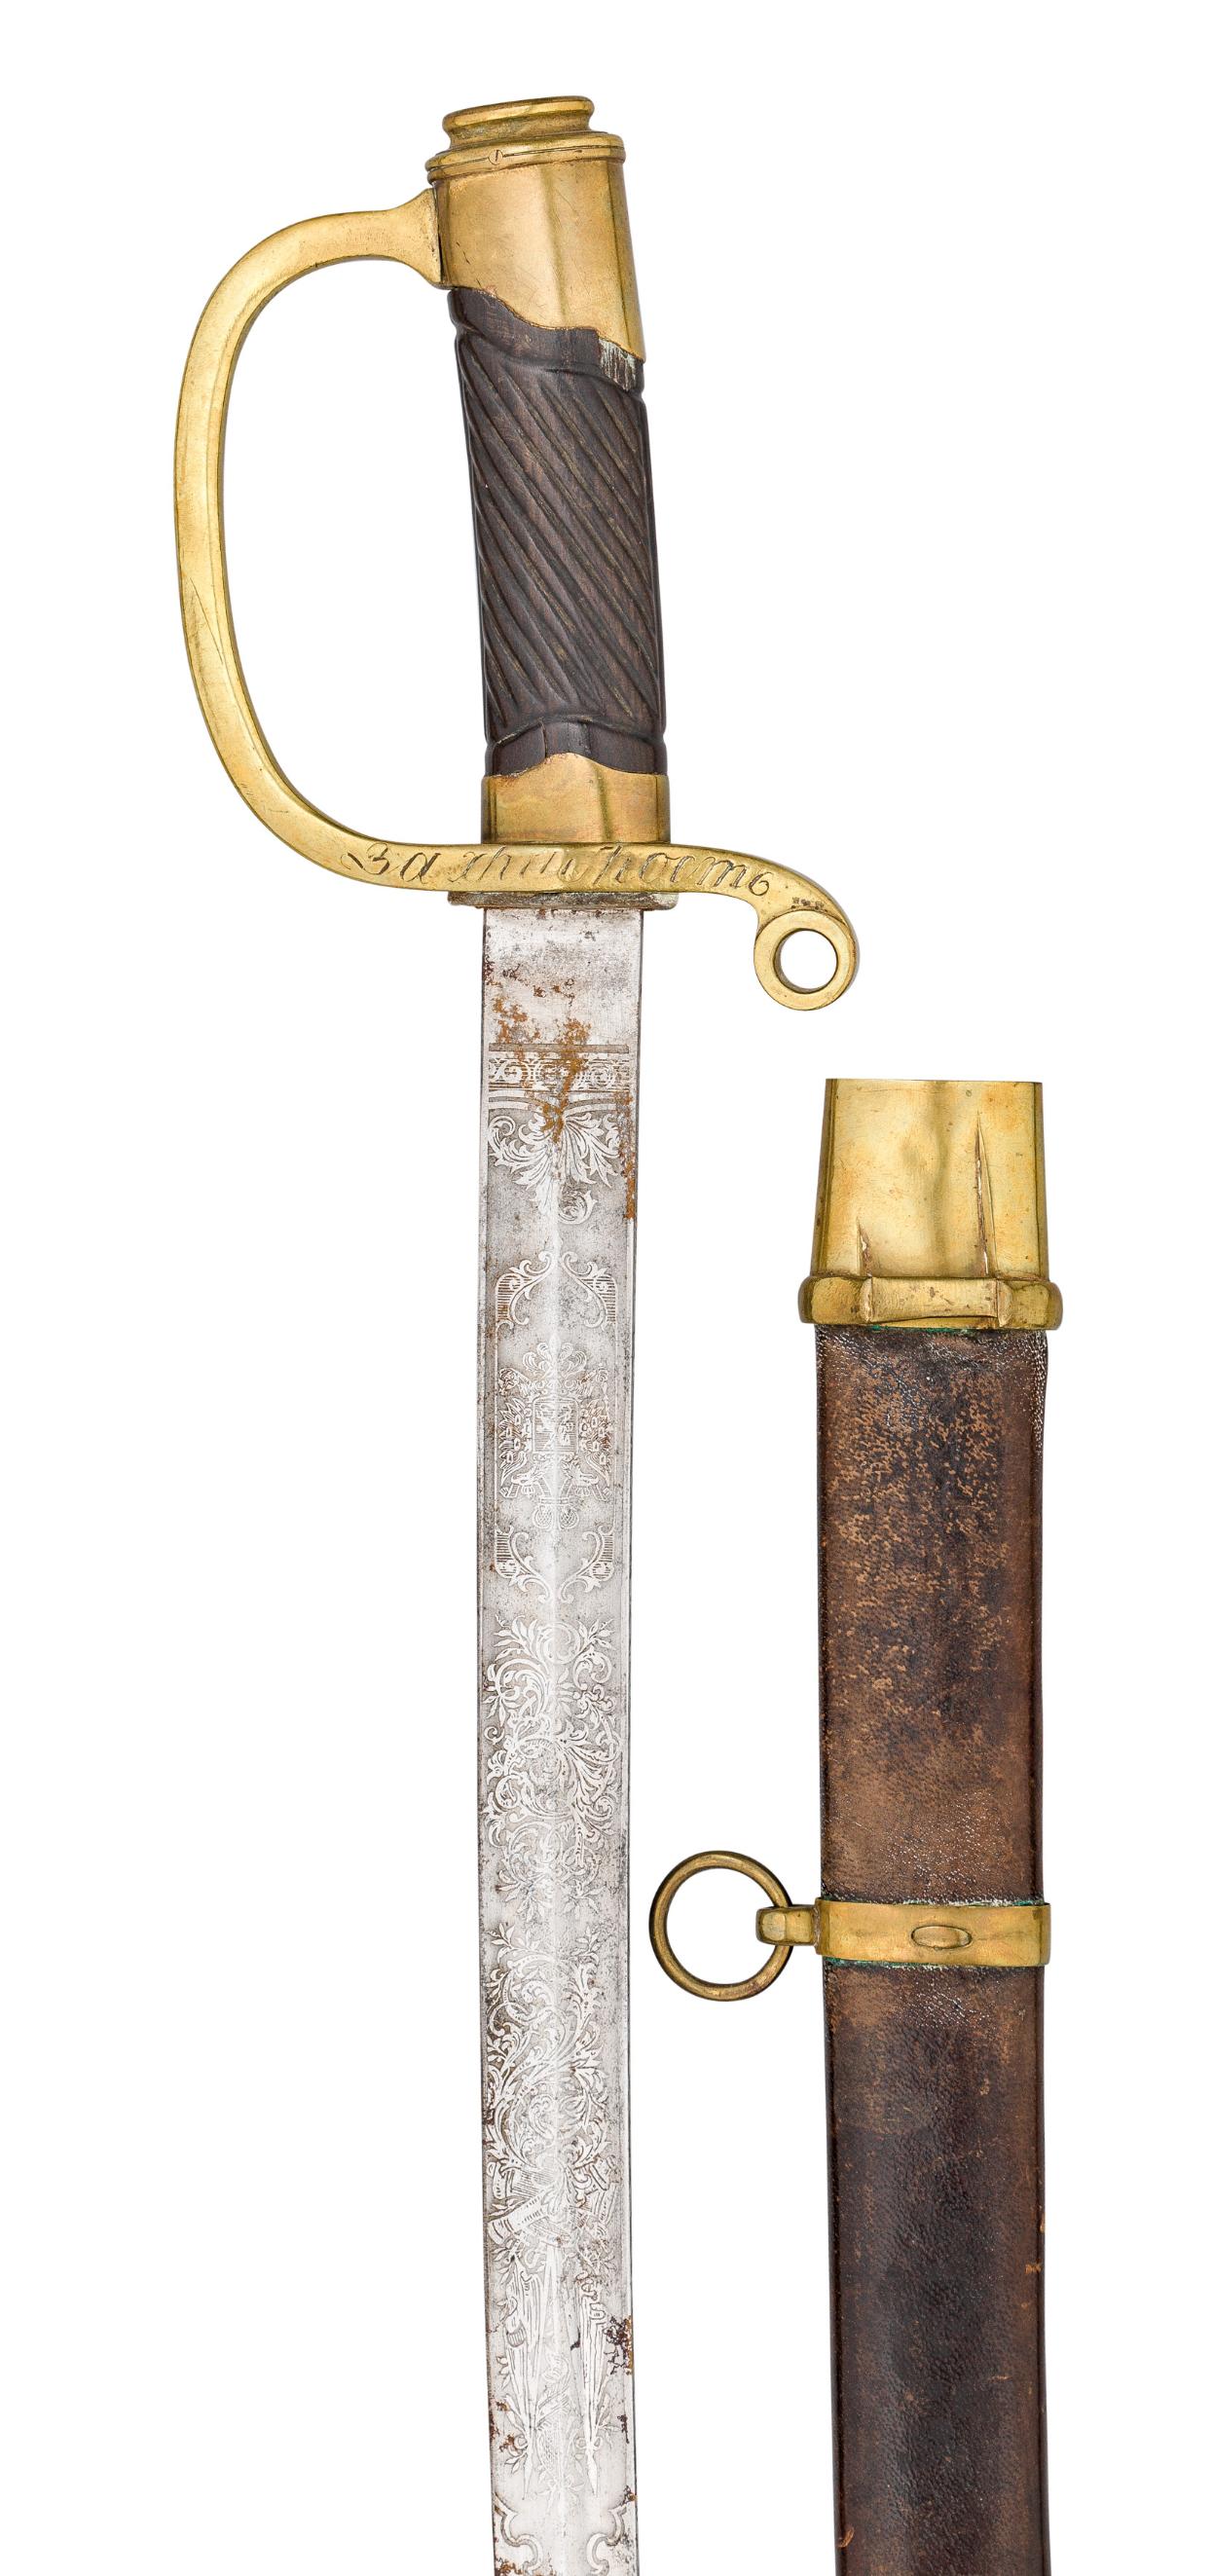 A RUSSIAN ALEXANDER III MODEL 1881 SHASKA FOR BRAVERY^ CIRCA 1881-94